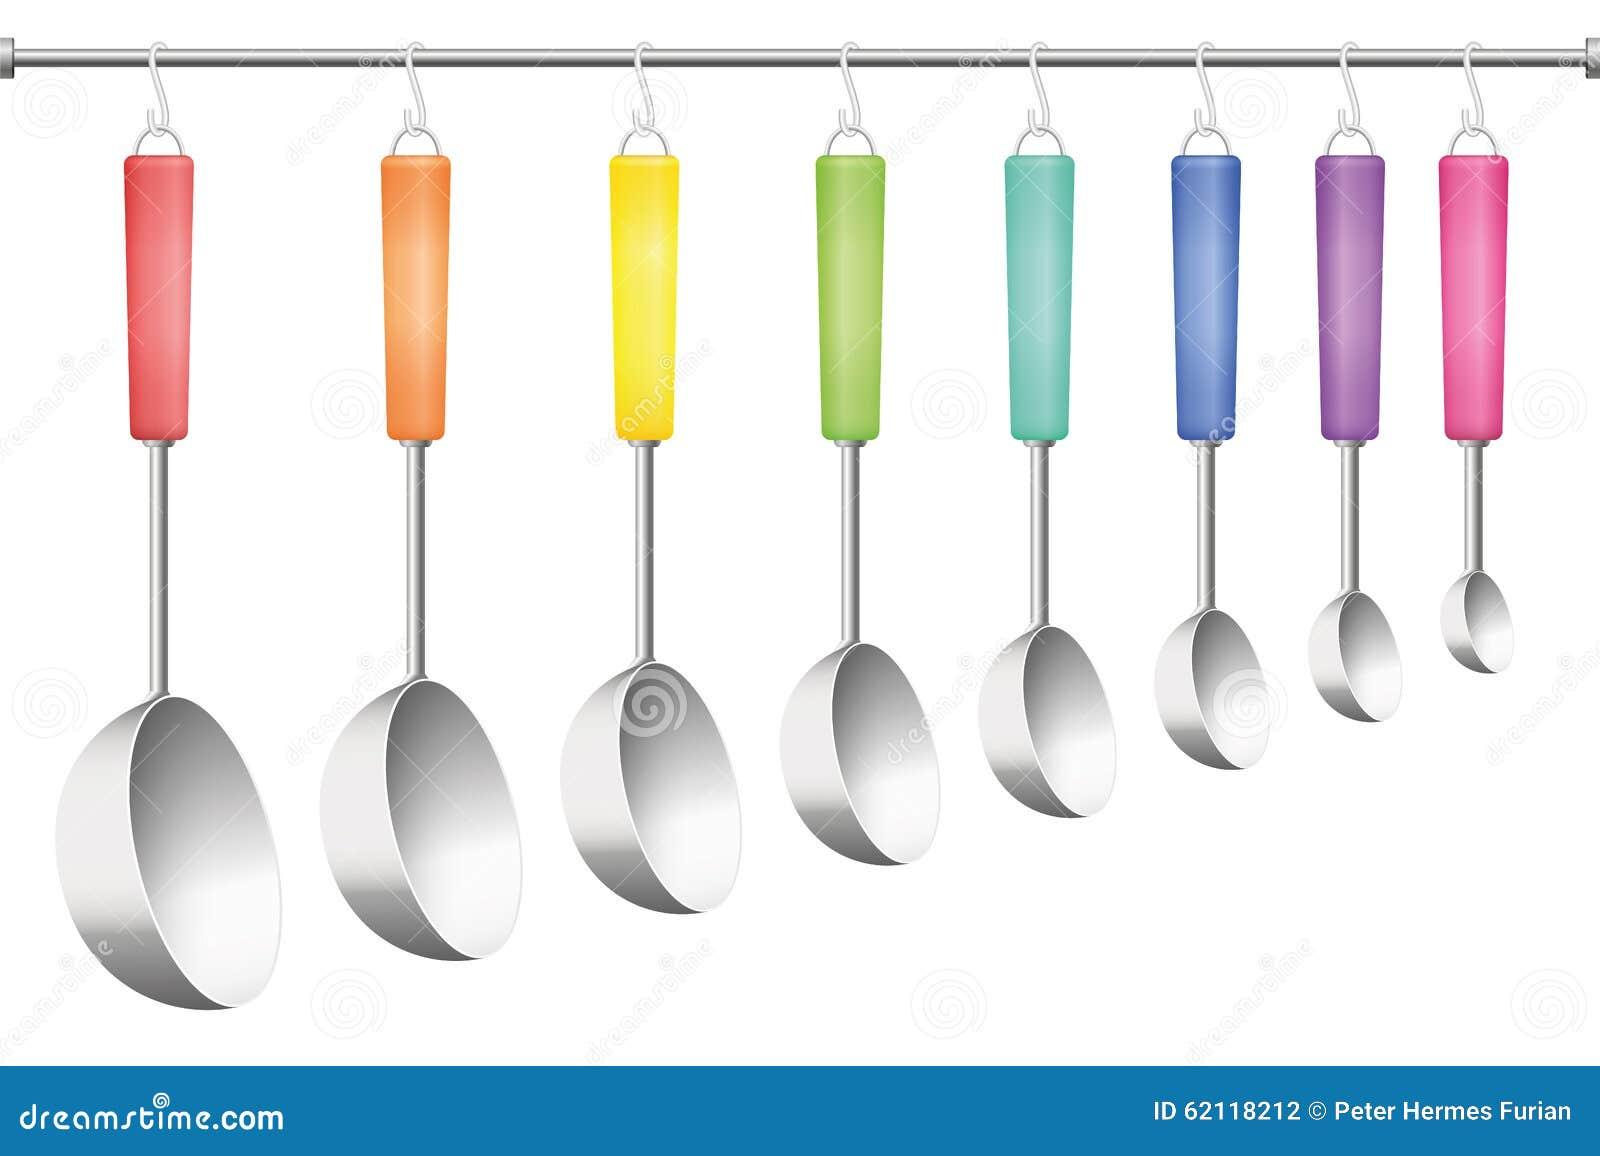 Colorful Kitchen Utensils Set